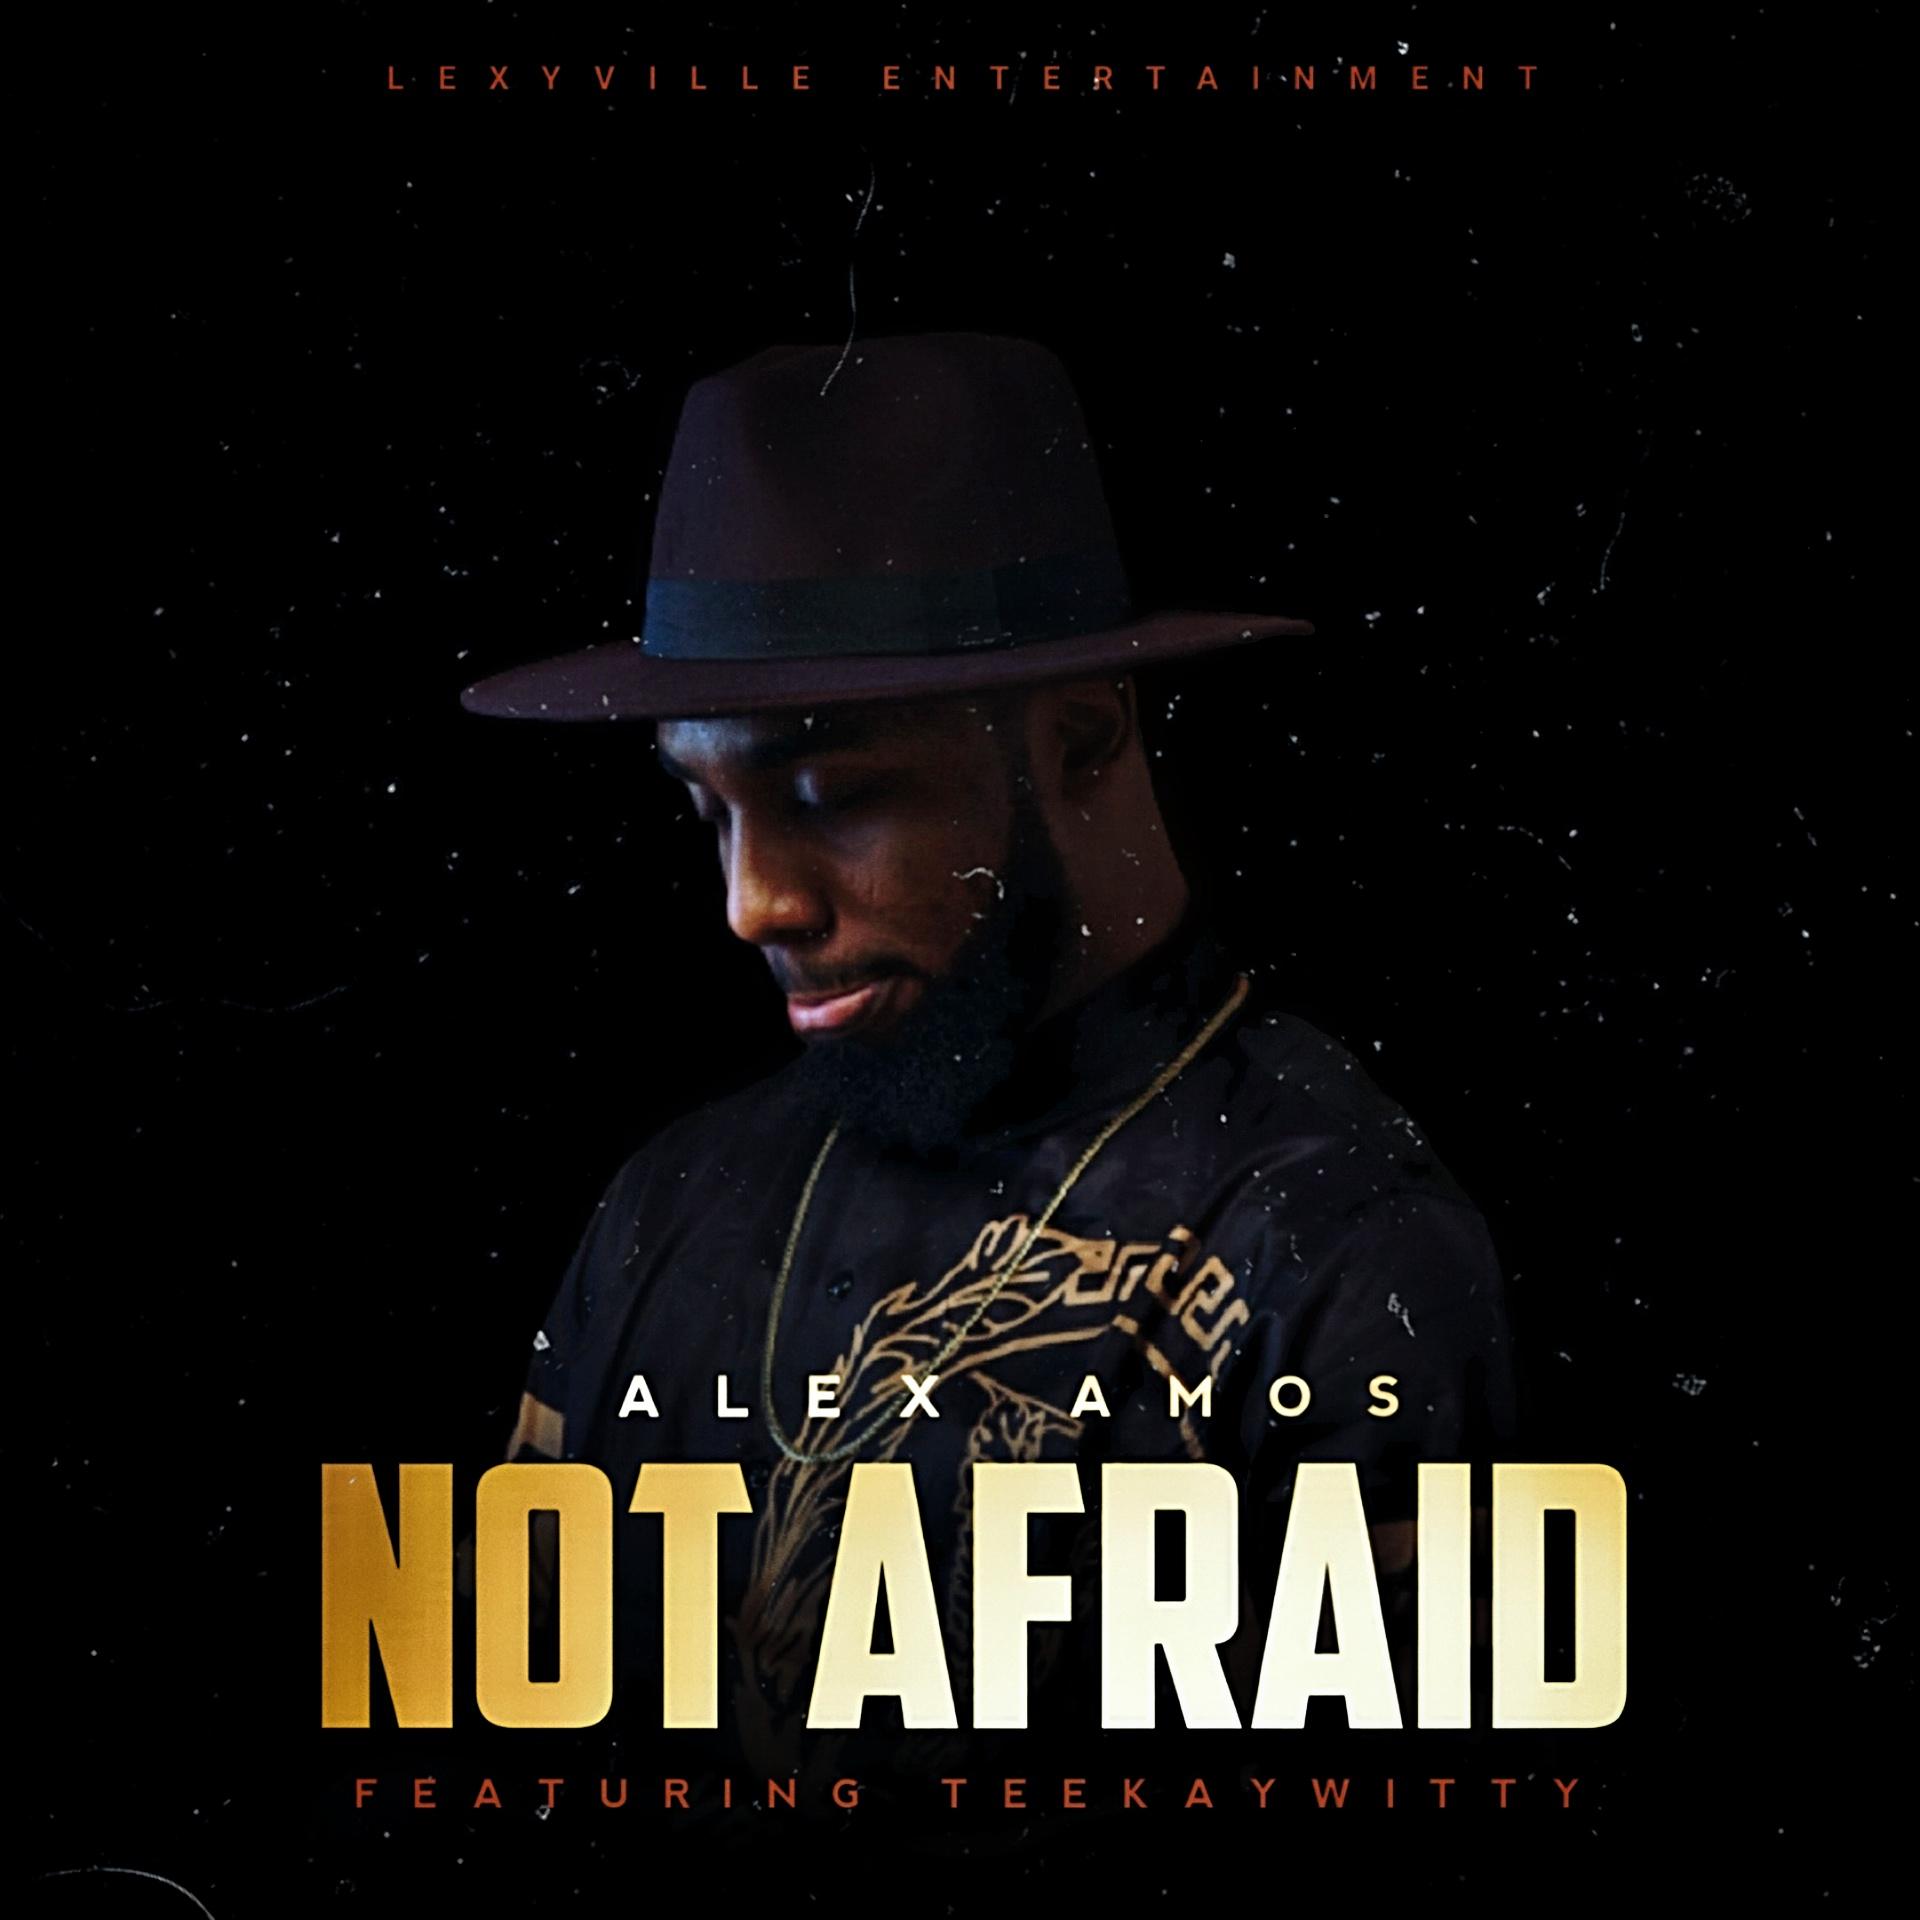 Alex Amos - Not Afraid ft. Teekaywitty